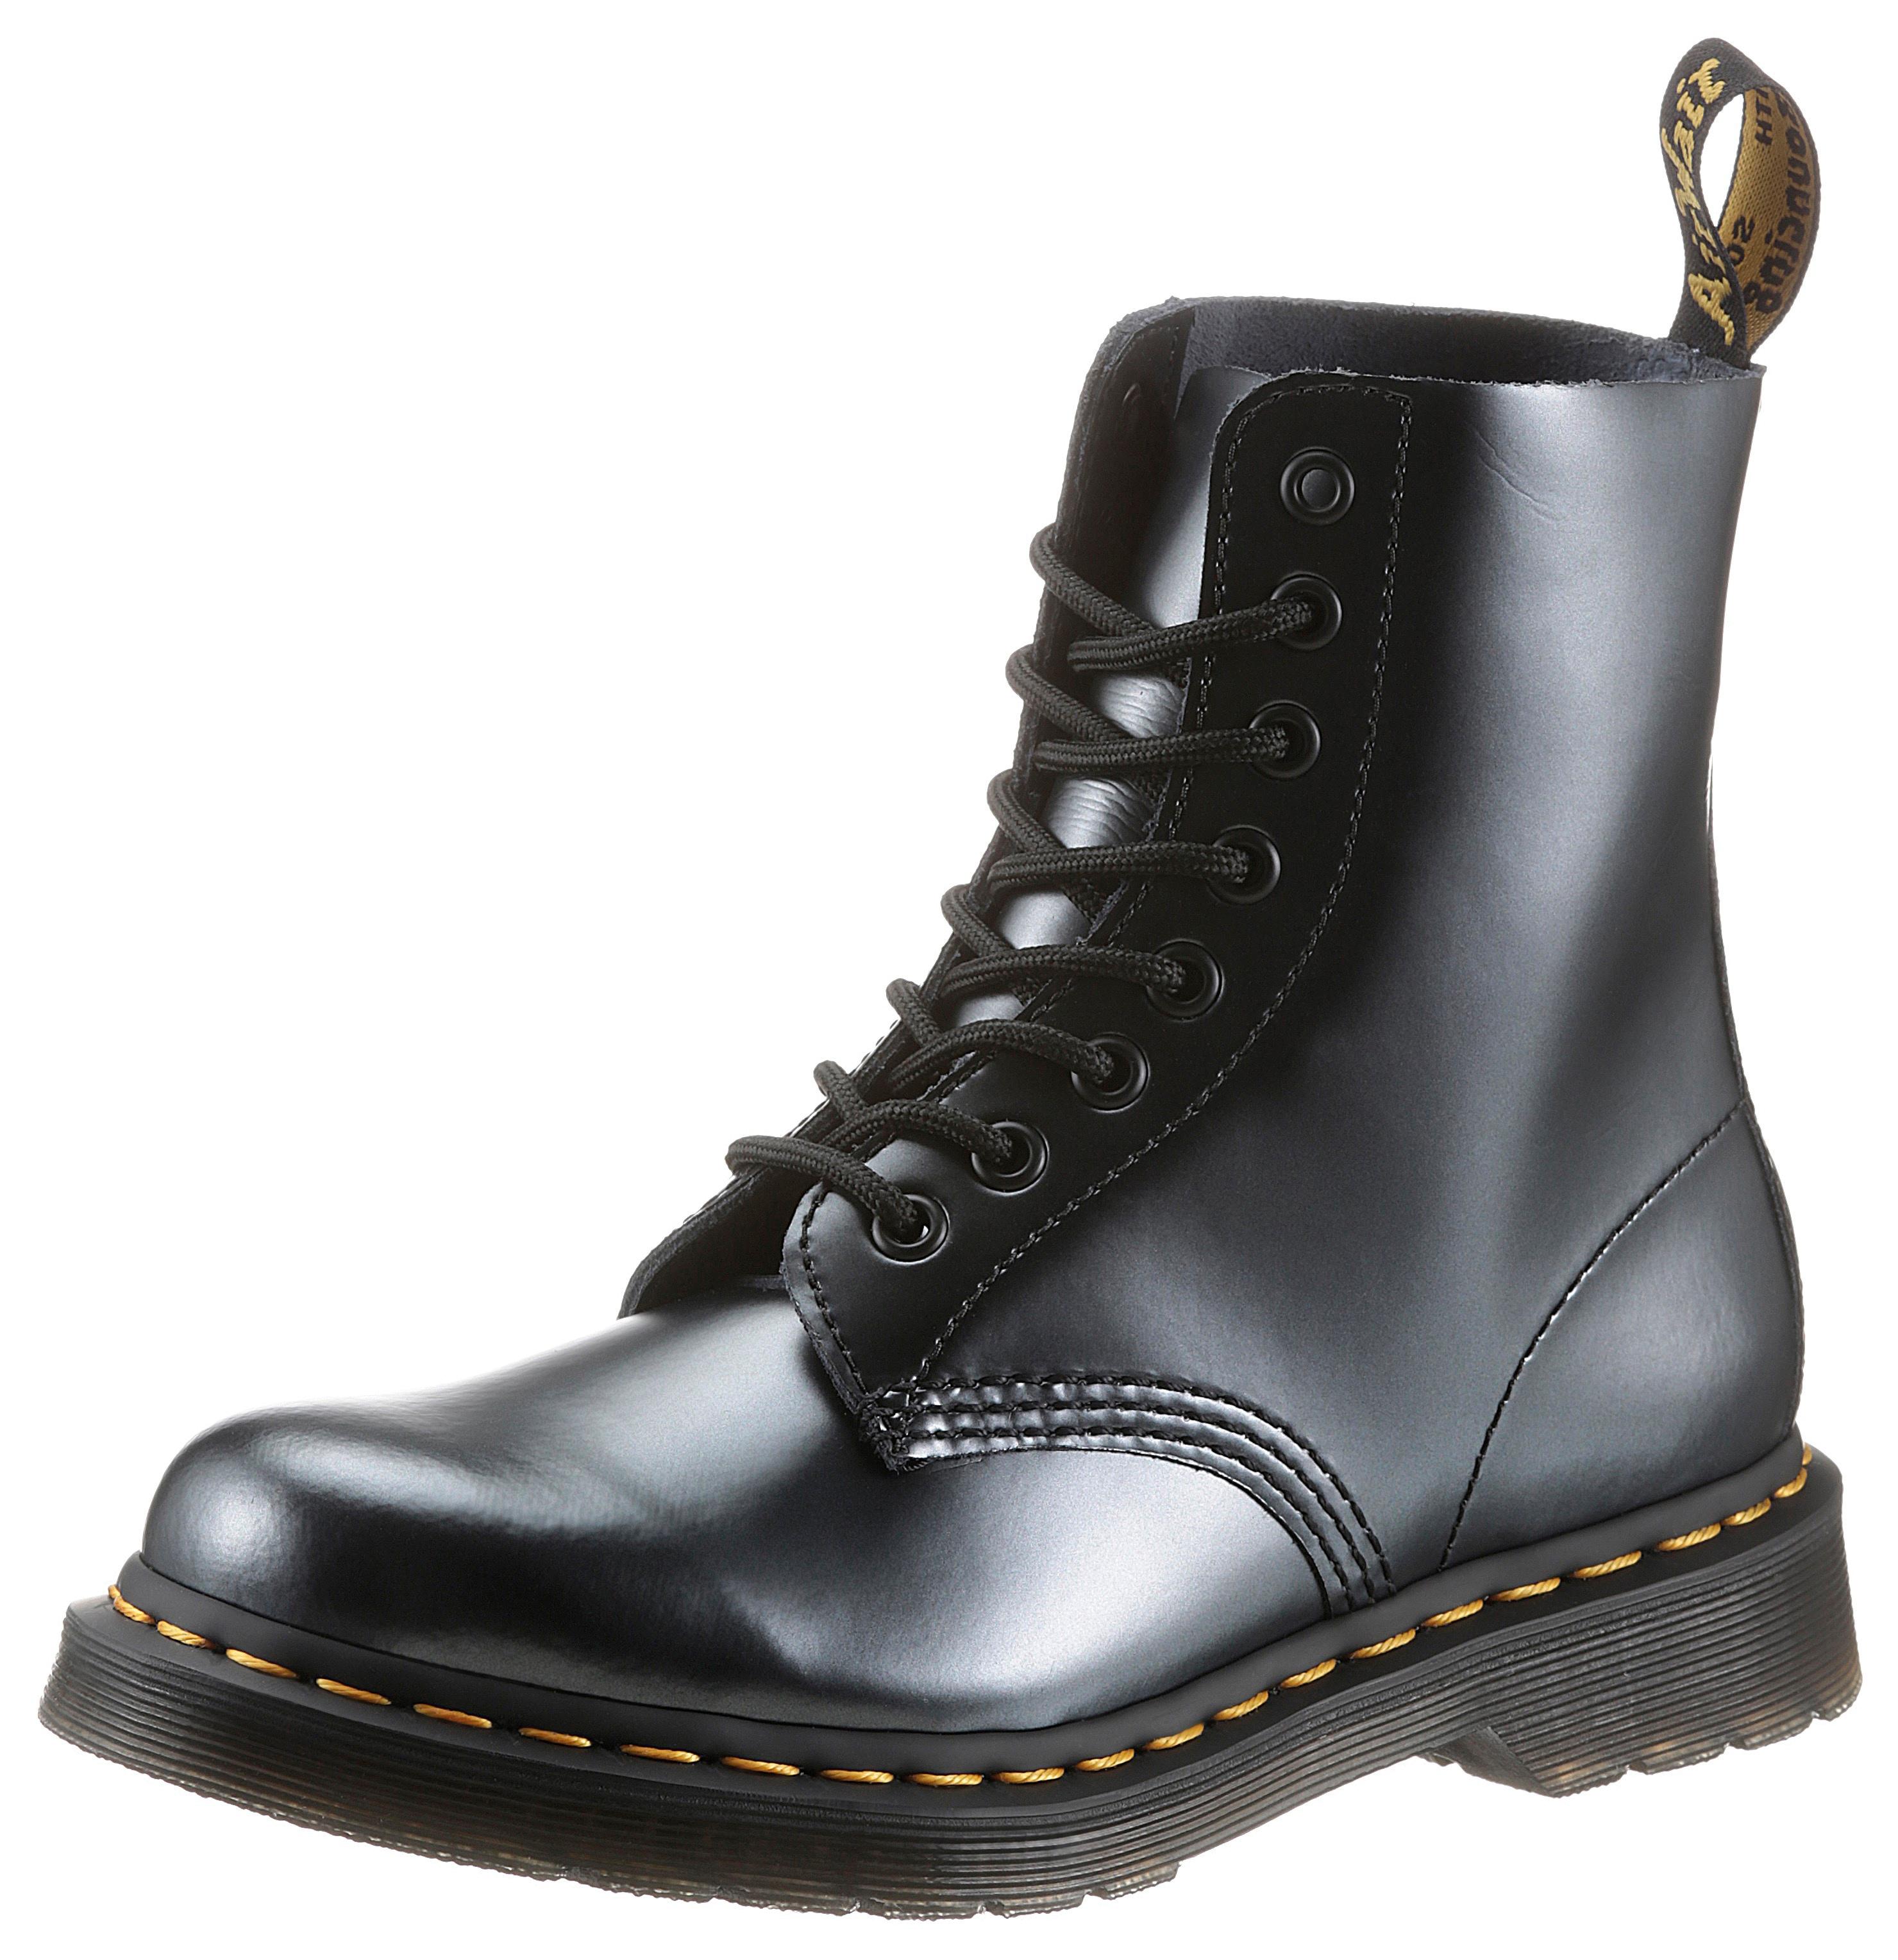 dr. martens -  Schnürstiefel 1460 Pascal 8 Eye Boot, im Metallic Look